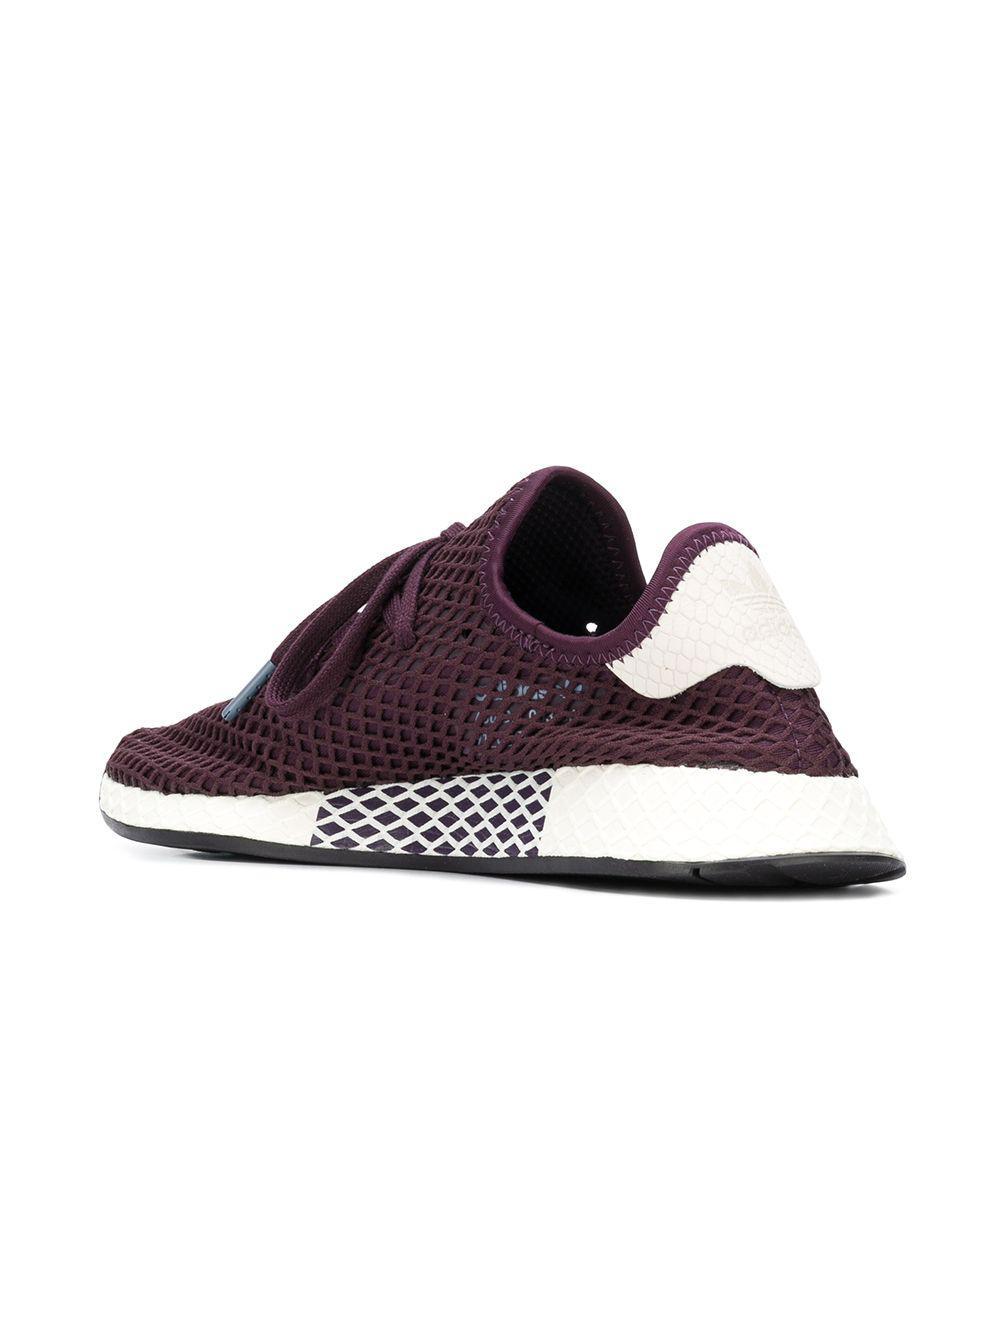 9e9db6e4038 Lyst - adidas Deerupt Runner Sneakers in Purple